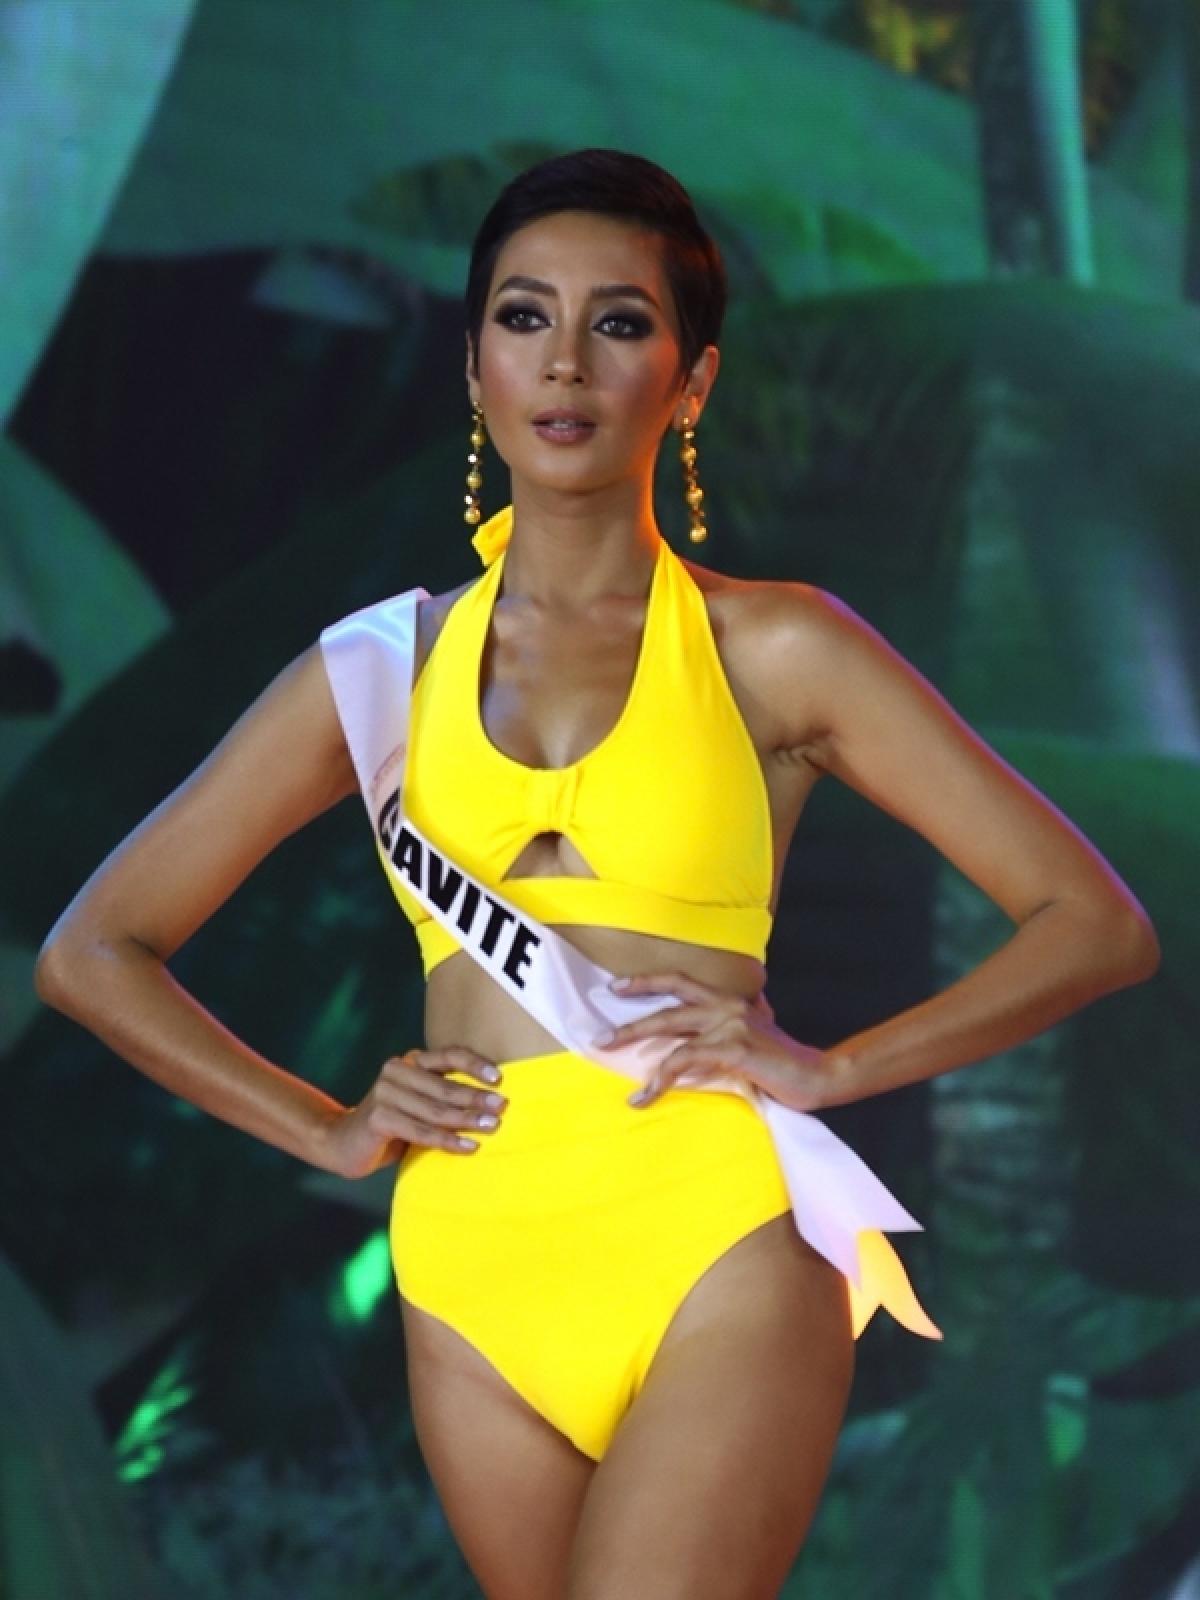 Kimberly Hakenson đại diện của Cavite.